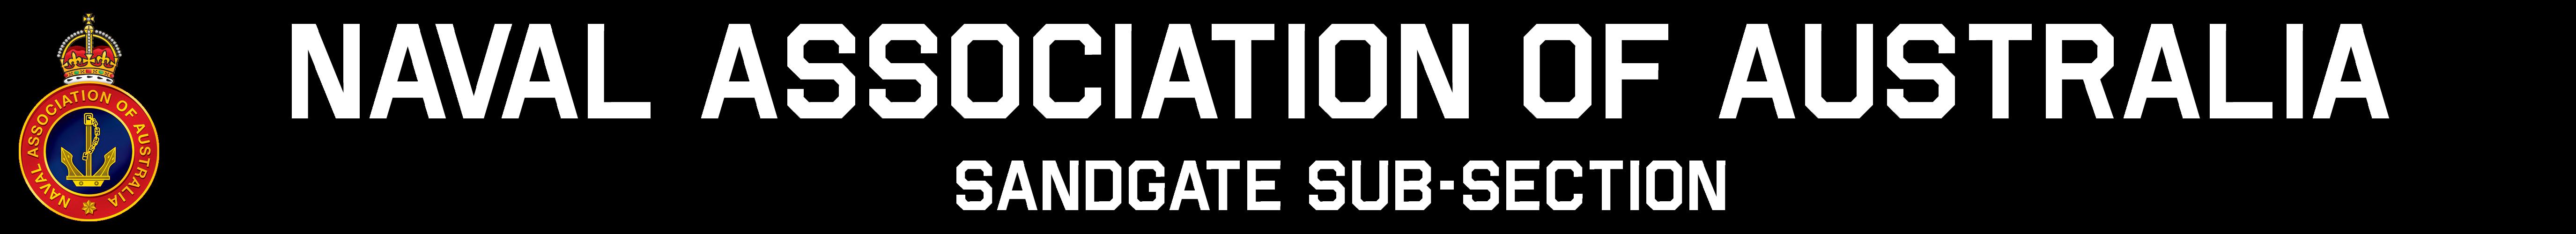 Naval Association of Australia (Sandgate Sub-Section)